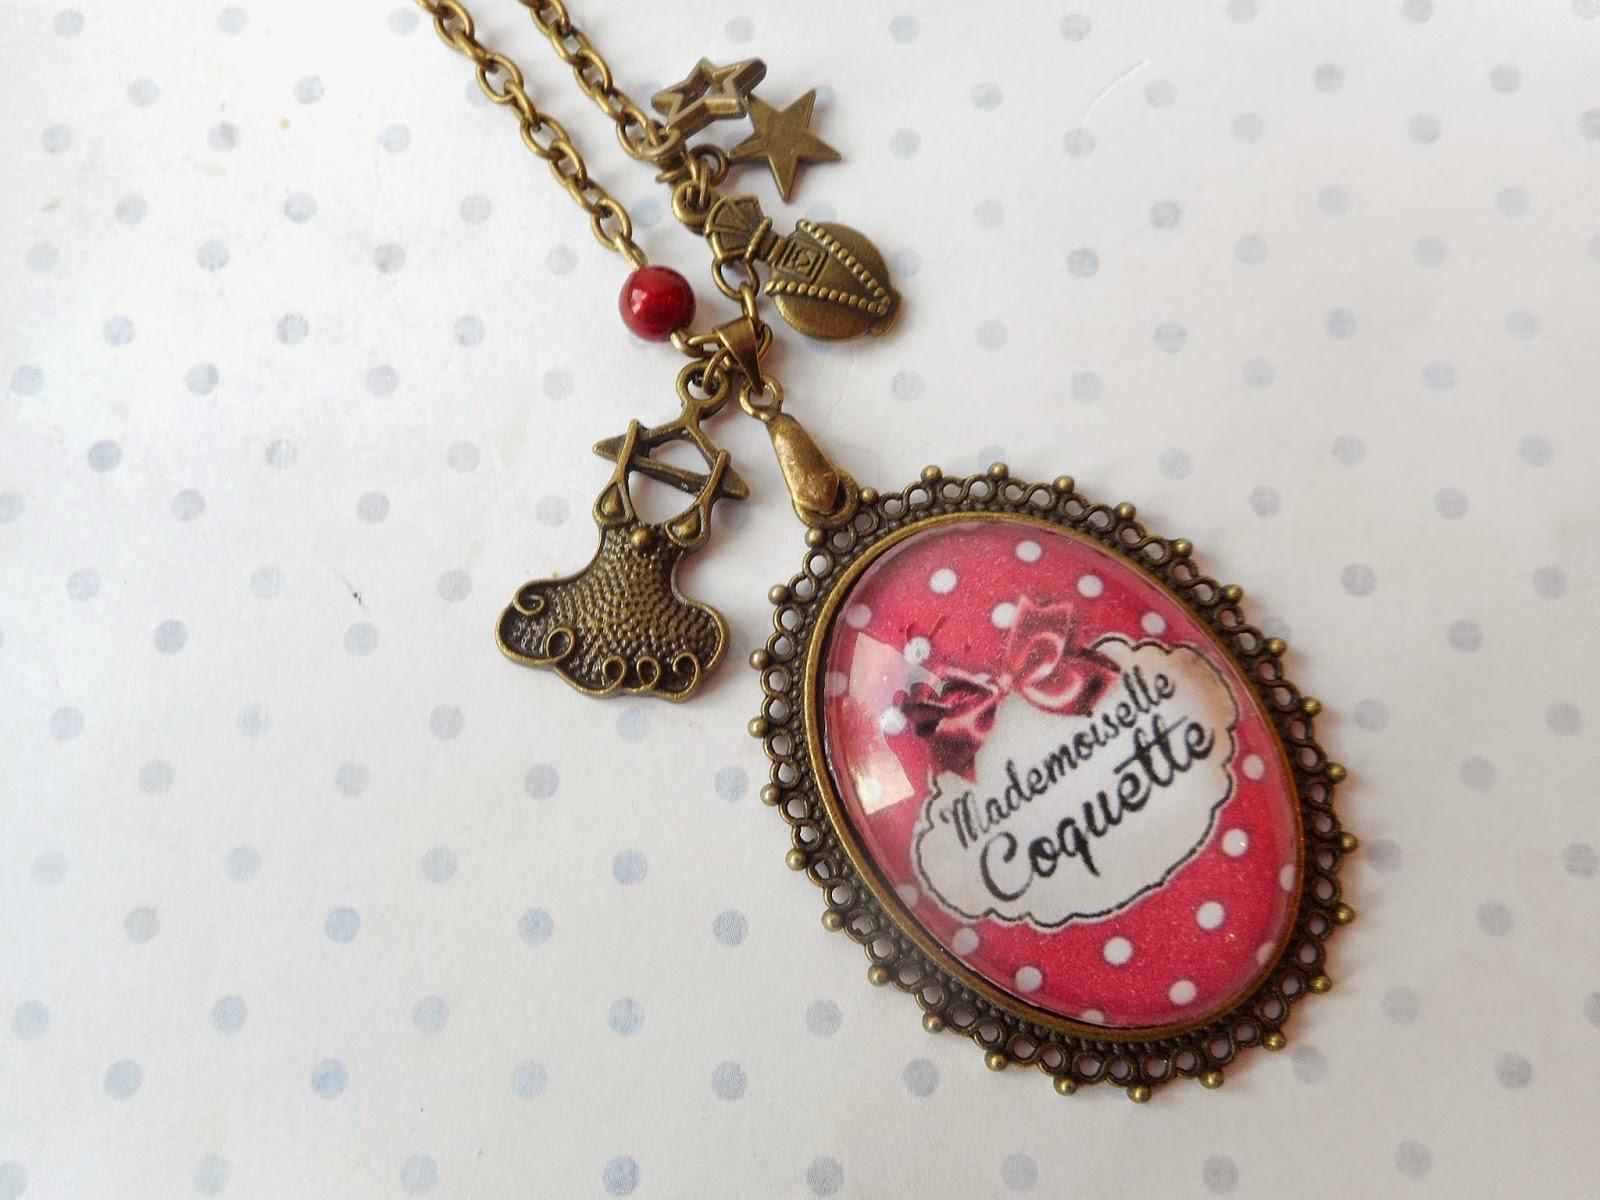 http://www.alittlemarket.com/collier/fr_sautoir_vintage_mademoiselle_coquette_les_pois_rouge_et_blanc_creation_miss_coopecoll_-11878117.html